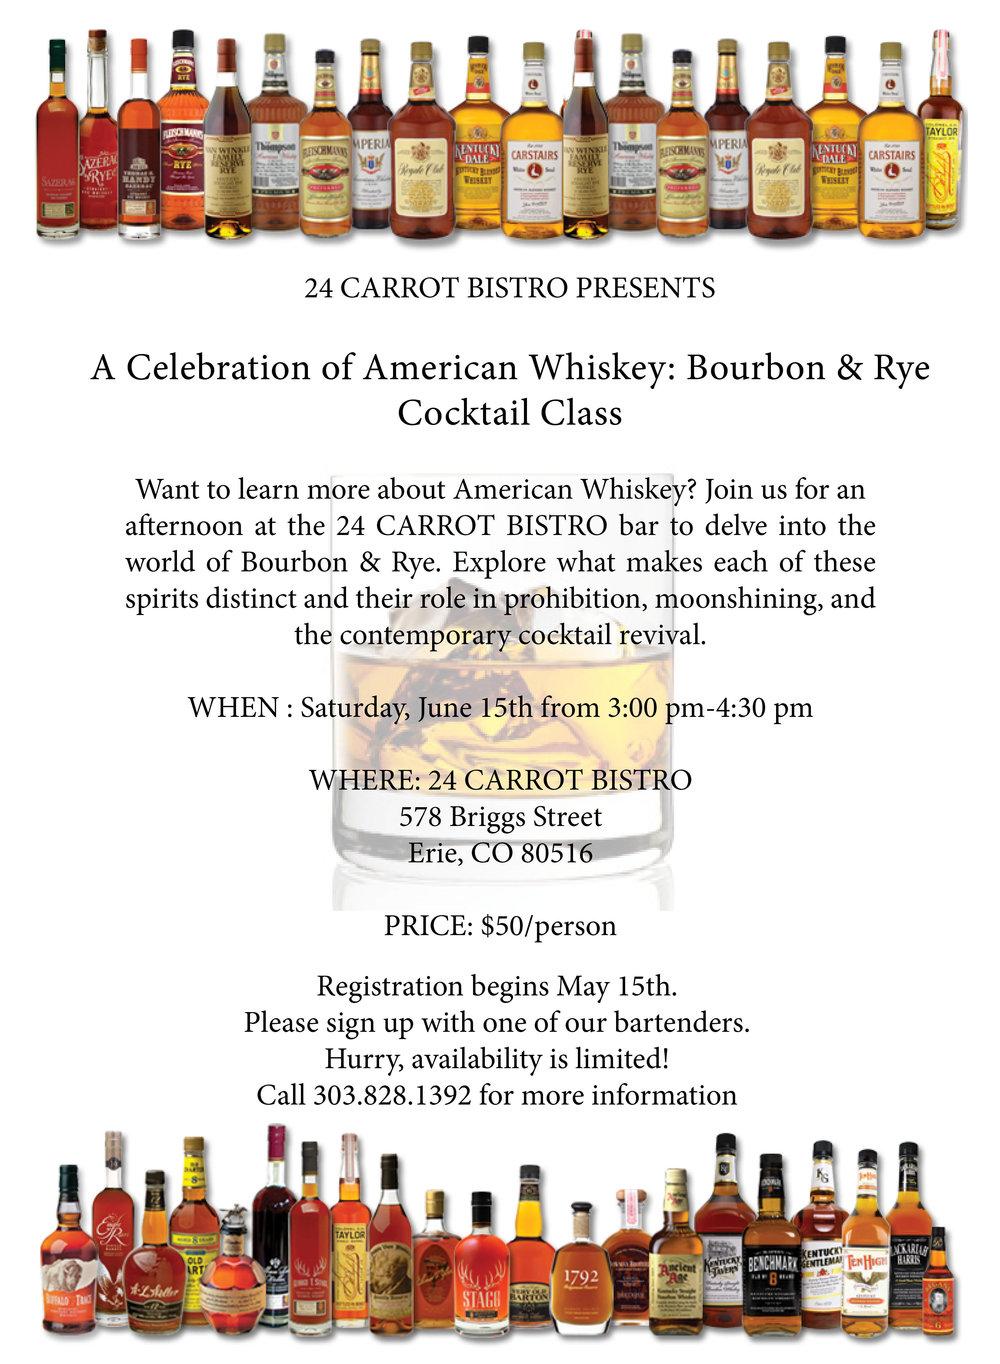 Cocktail Class Whiskey 2019 web.jpg